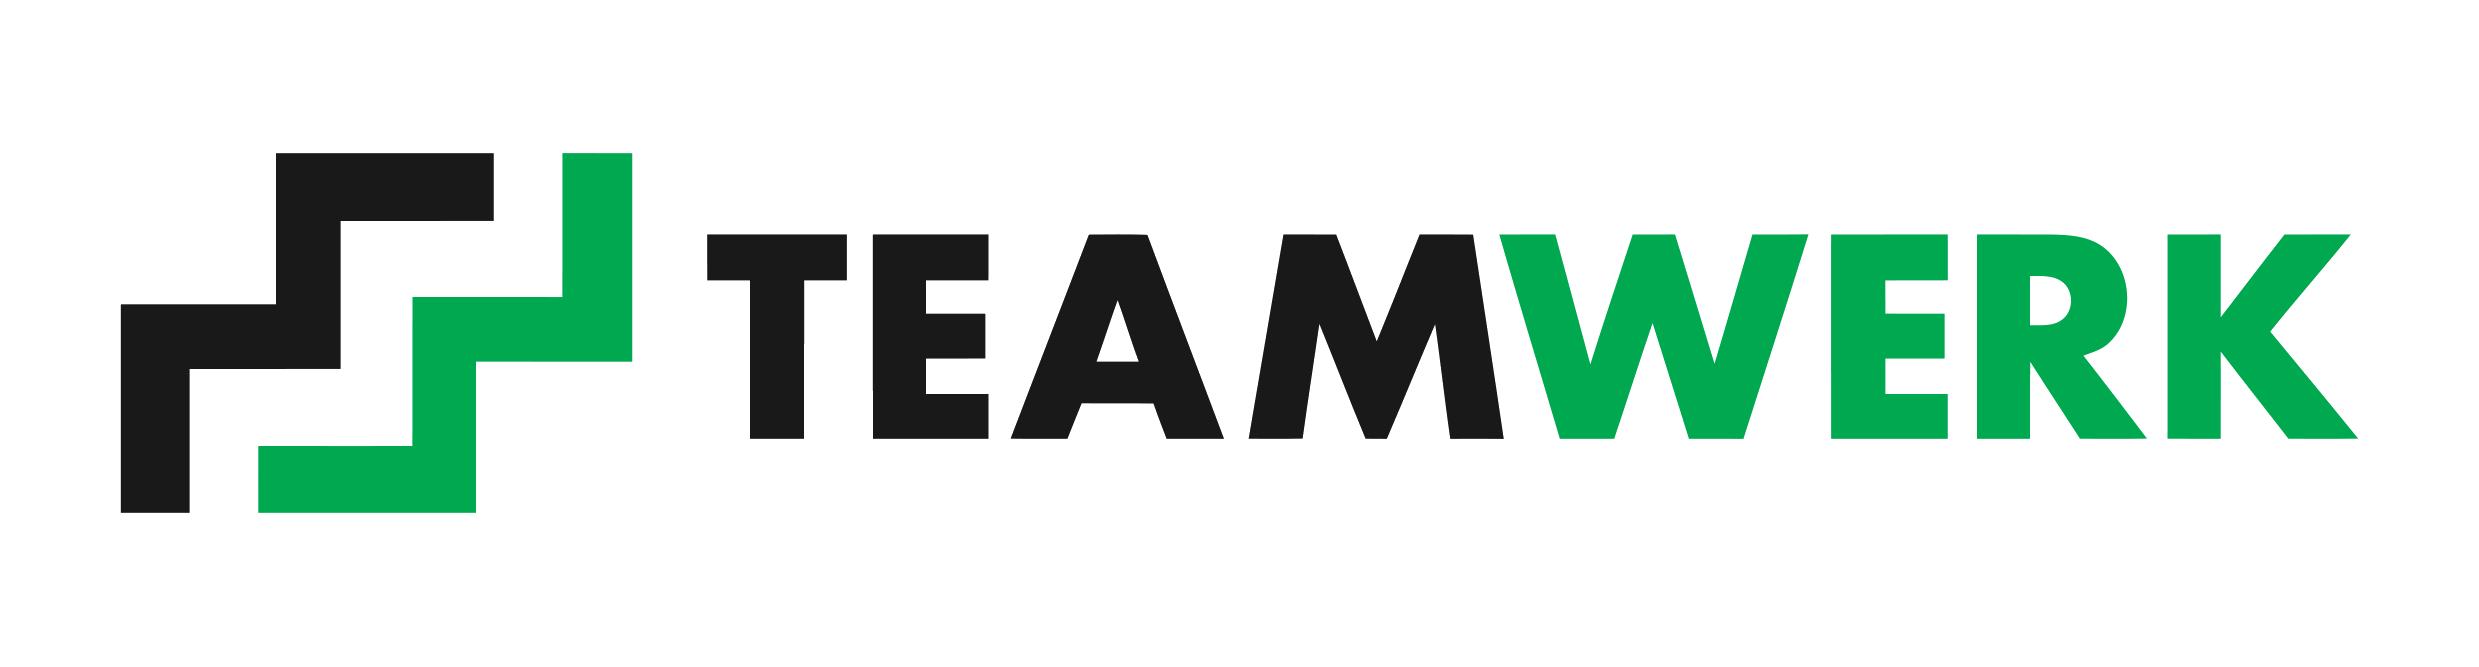 Teamwerk-Logo-EPSkopiekopiekopie1